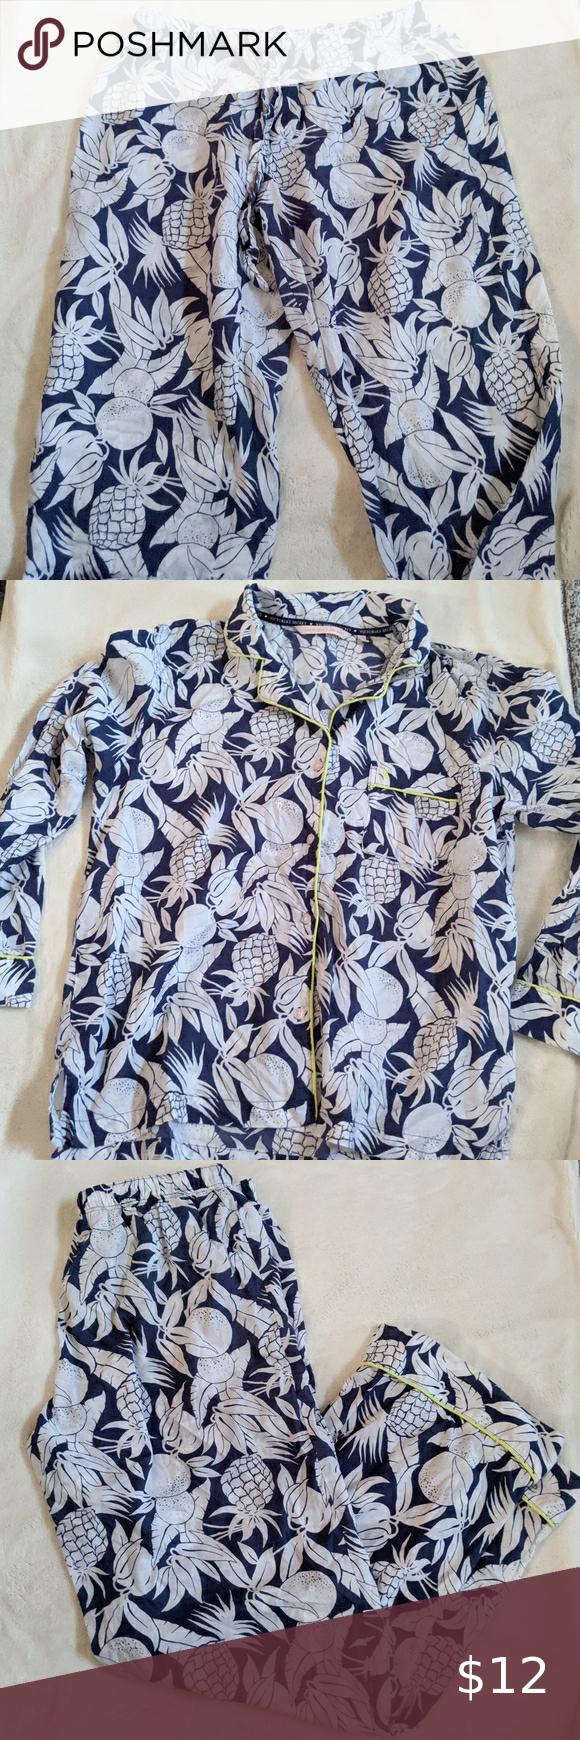 Victoria's Secret printed pajama set in 2020 Print